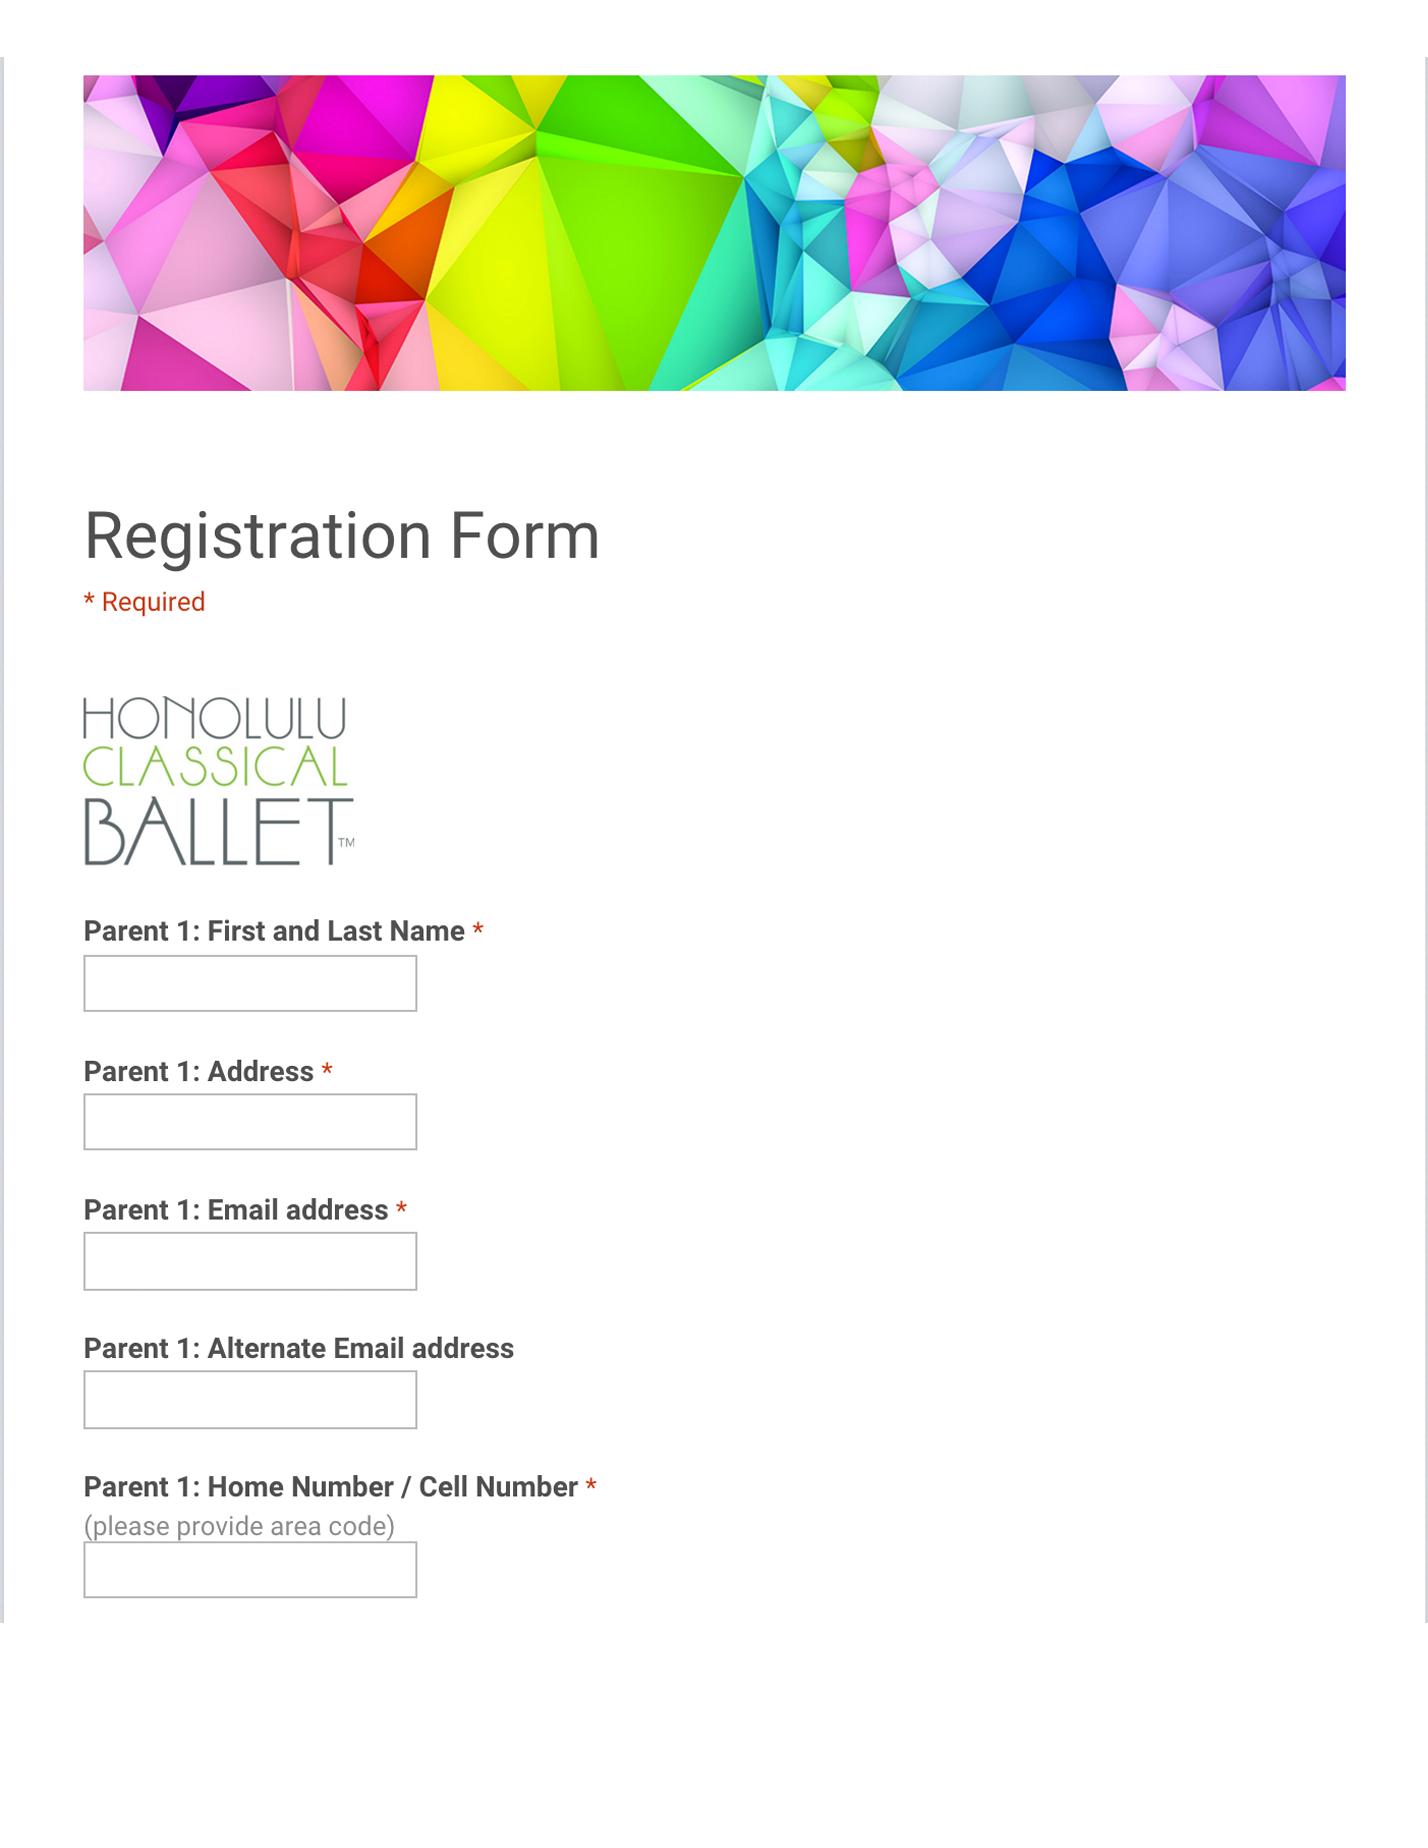 Registration Form via Google forms